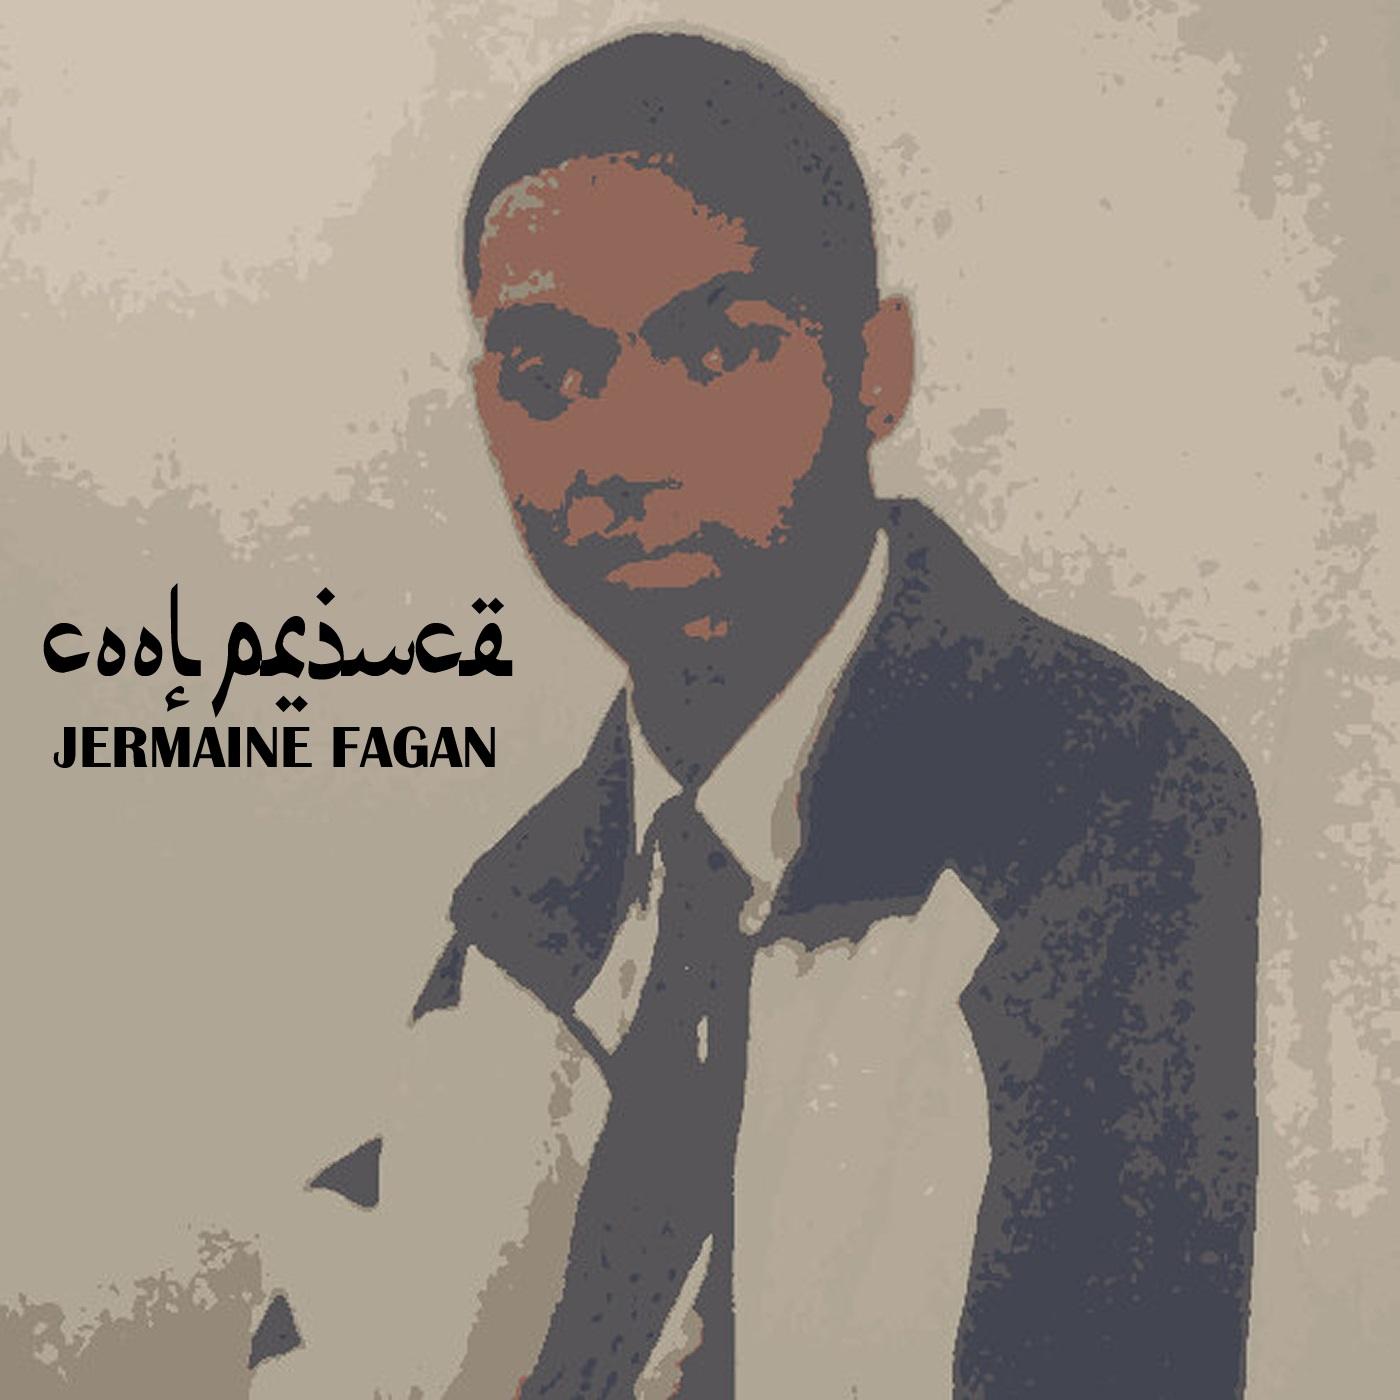 Cool Prince-Jermaine Fagan